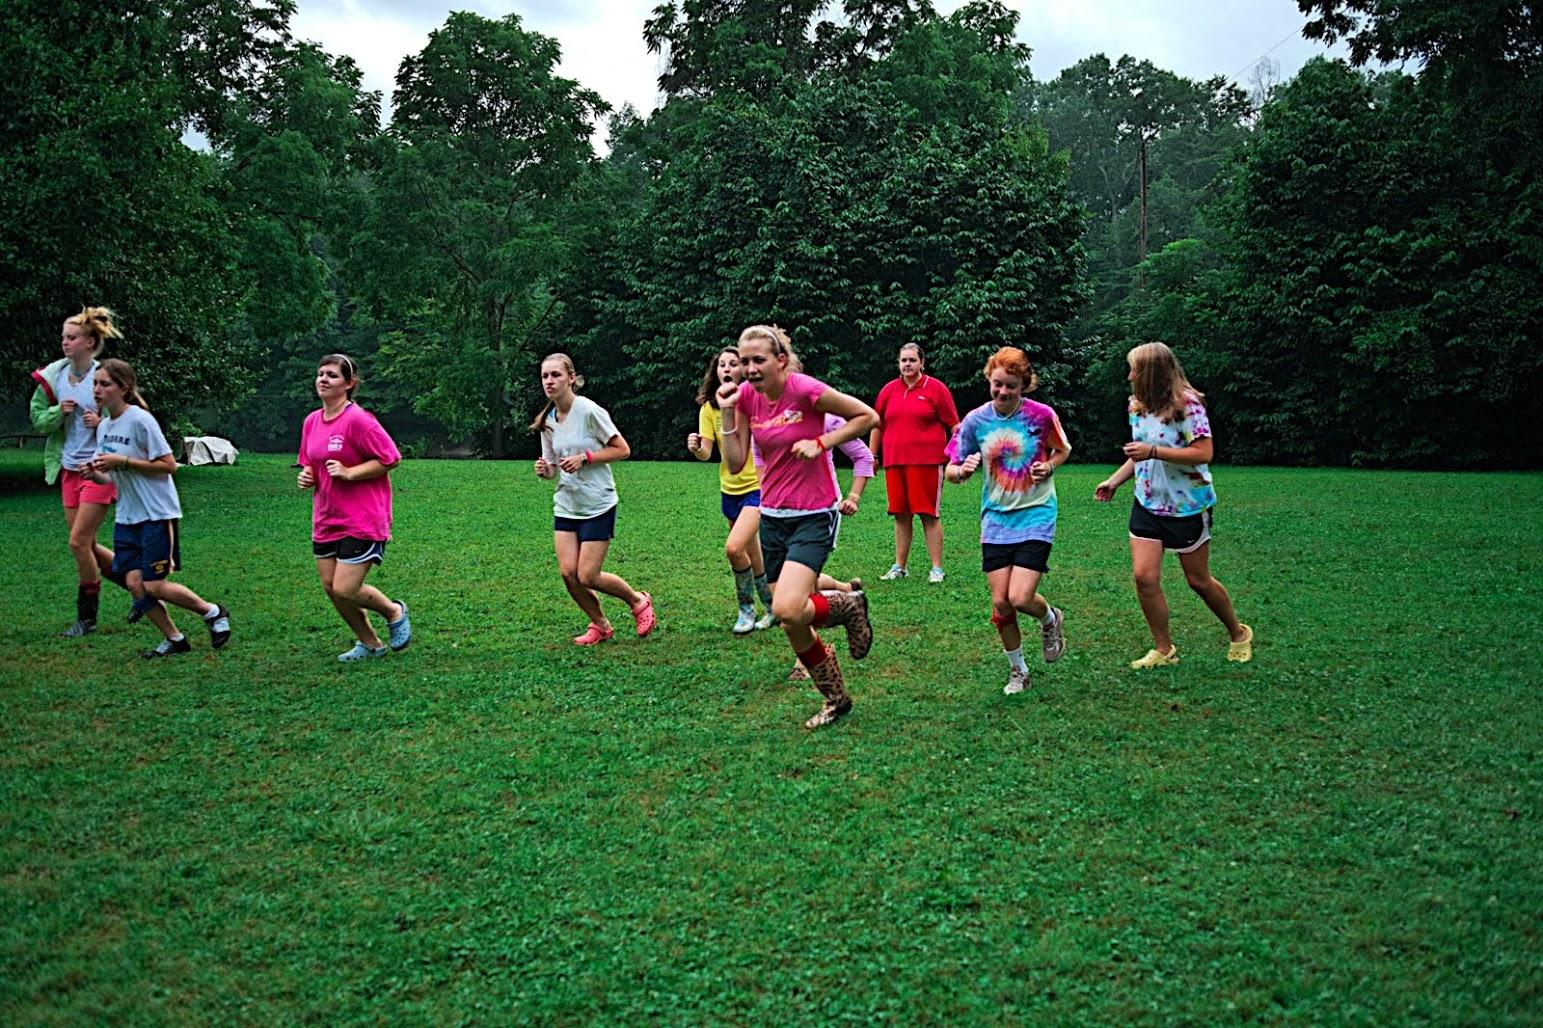 Camp fitness